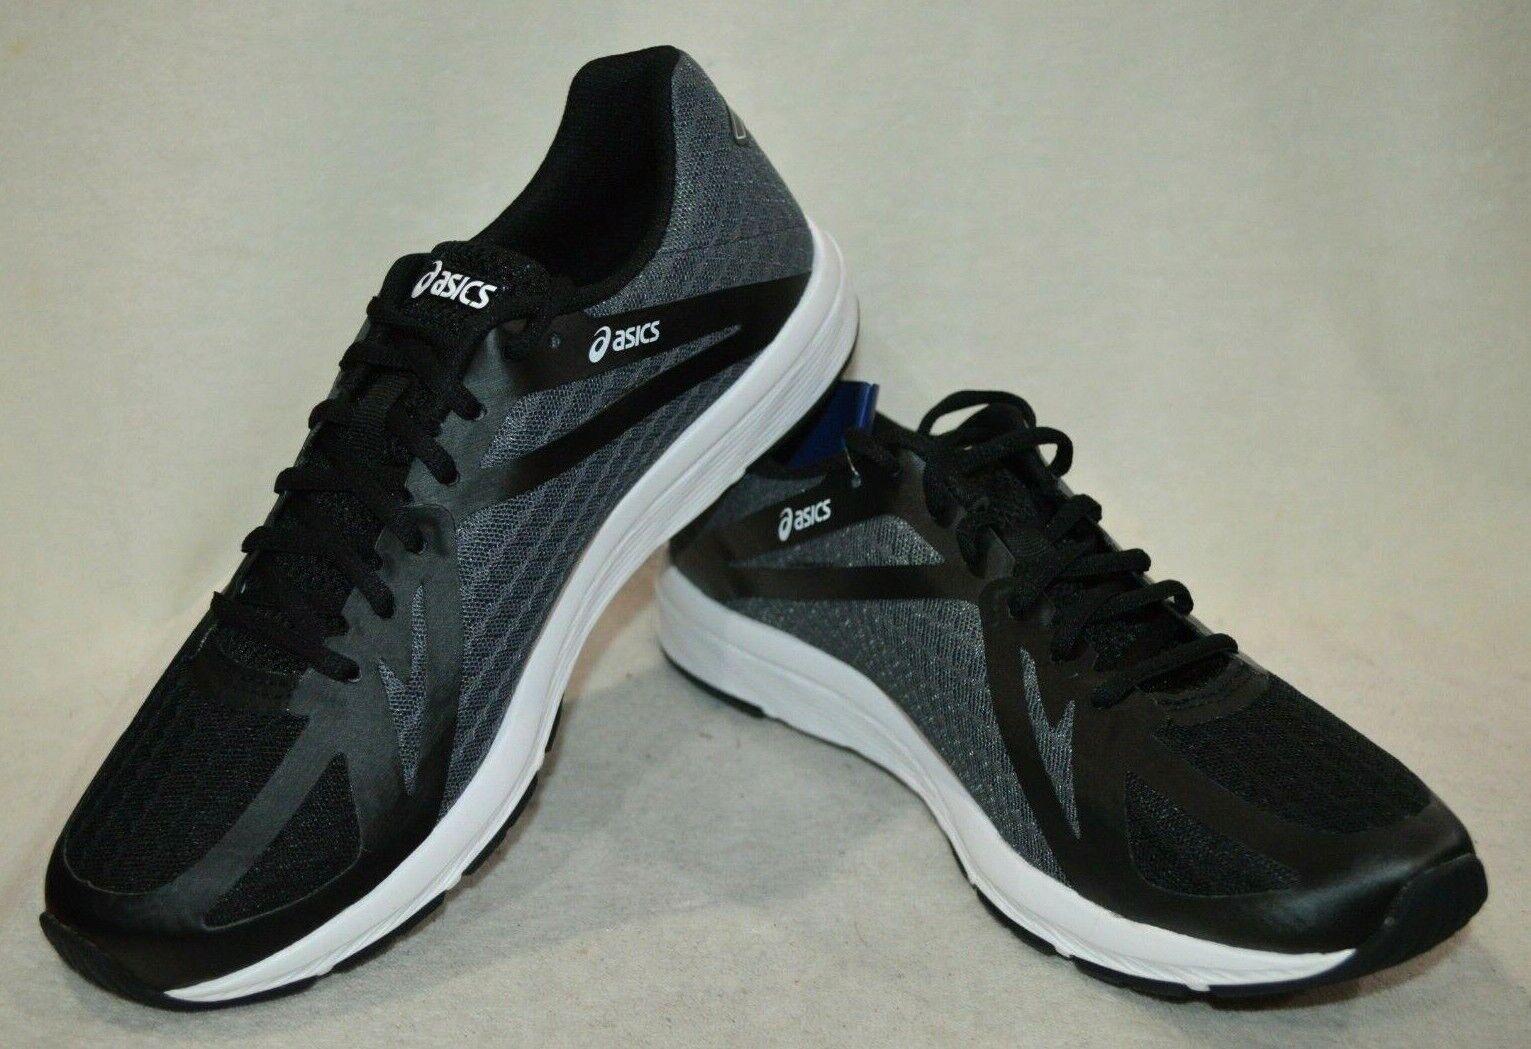 ASICS AMPLICA nero bianca Lightweight Wouomo Running scarpe-Dimensione 9.5 10.5 11 NWB